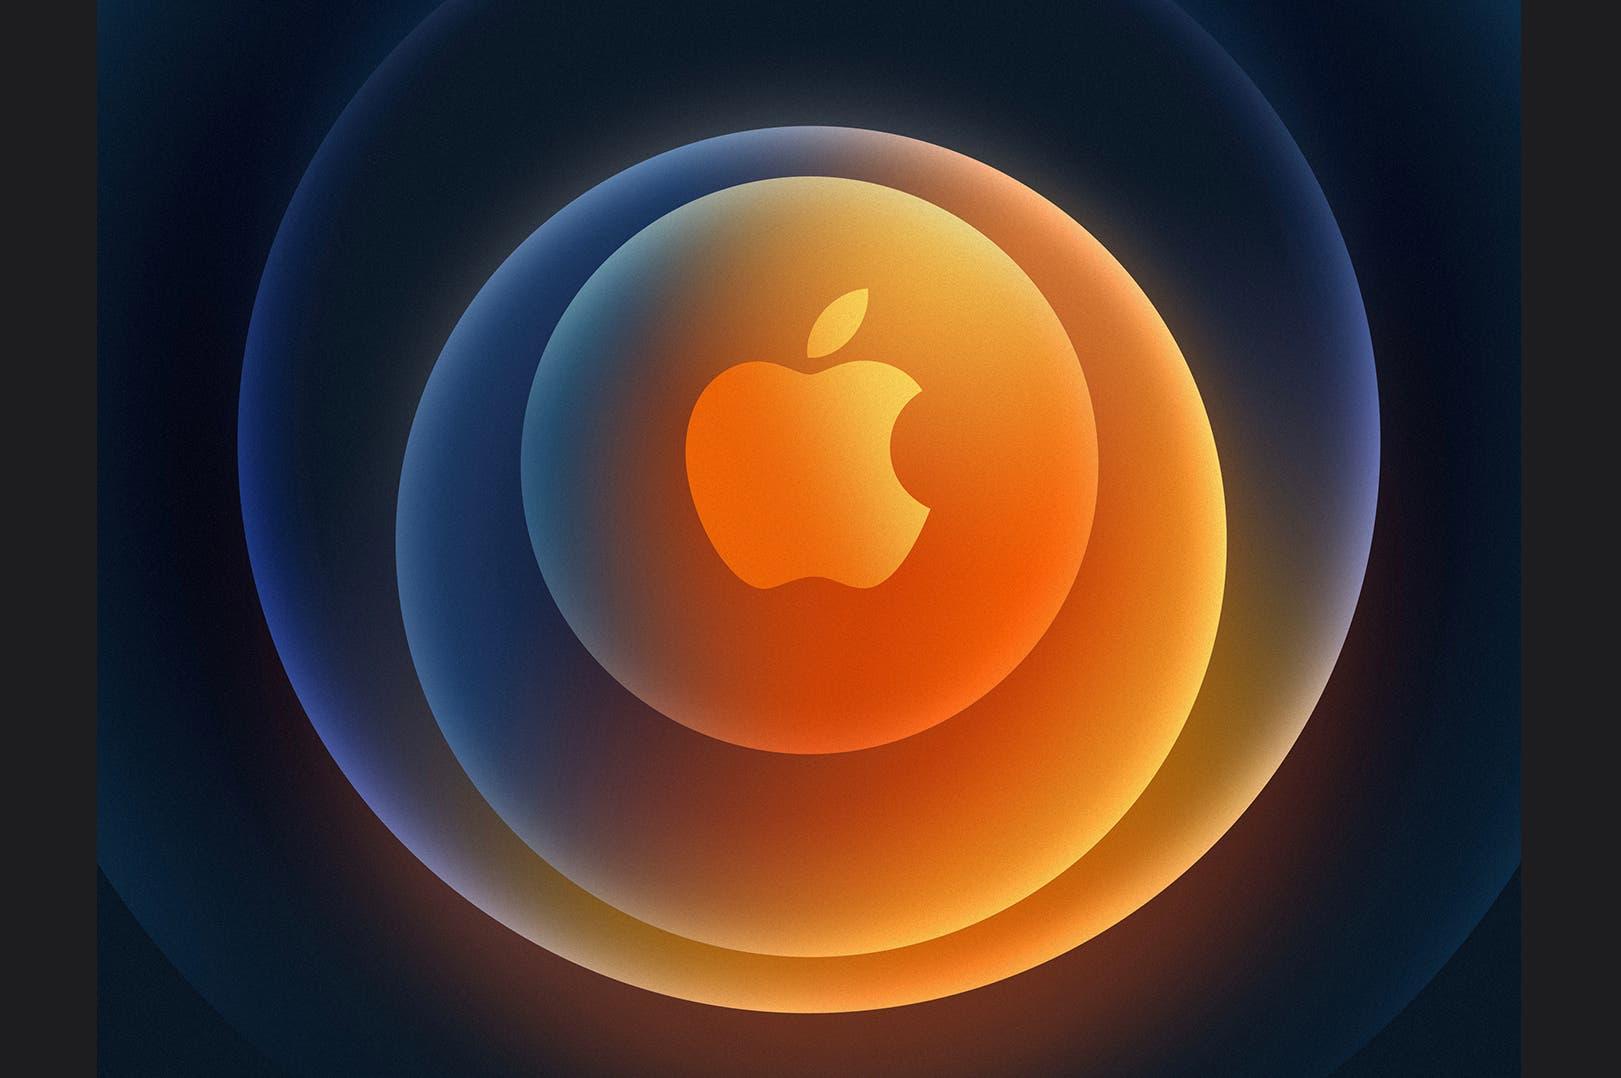 Apple Event zum iPhone 12 (Pro)